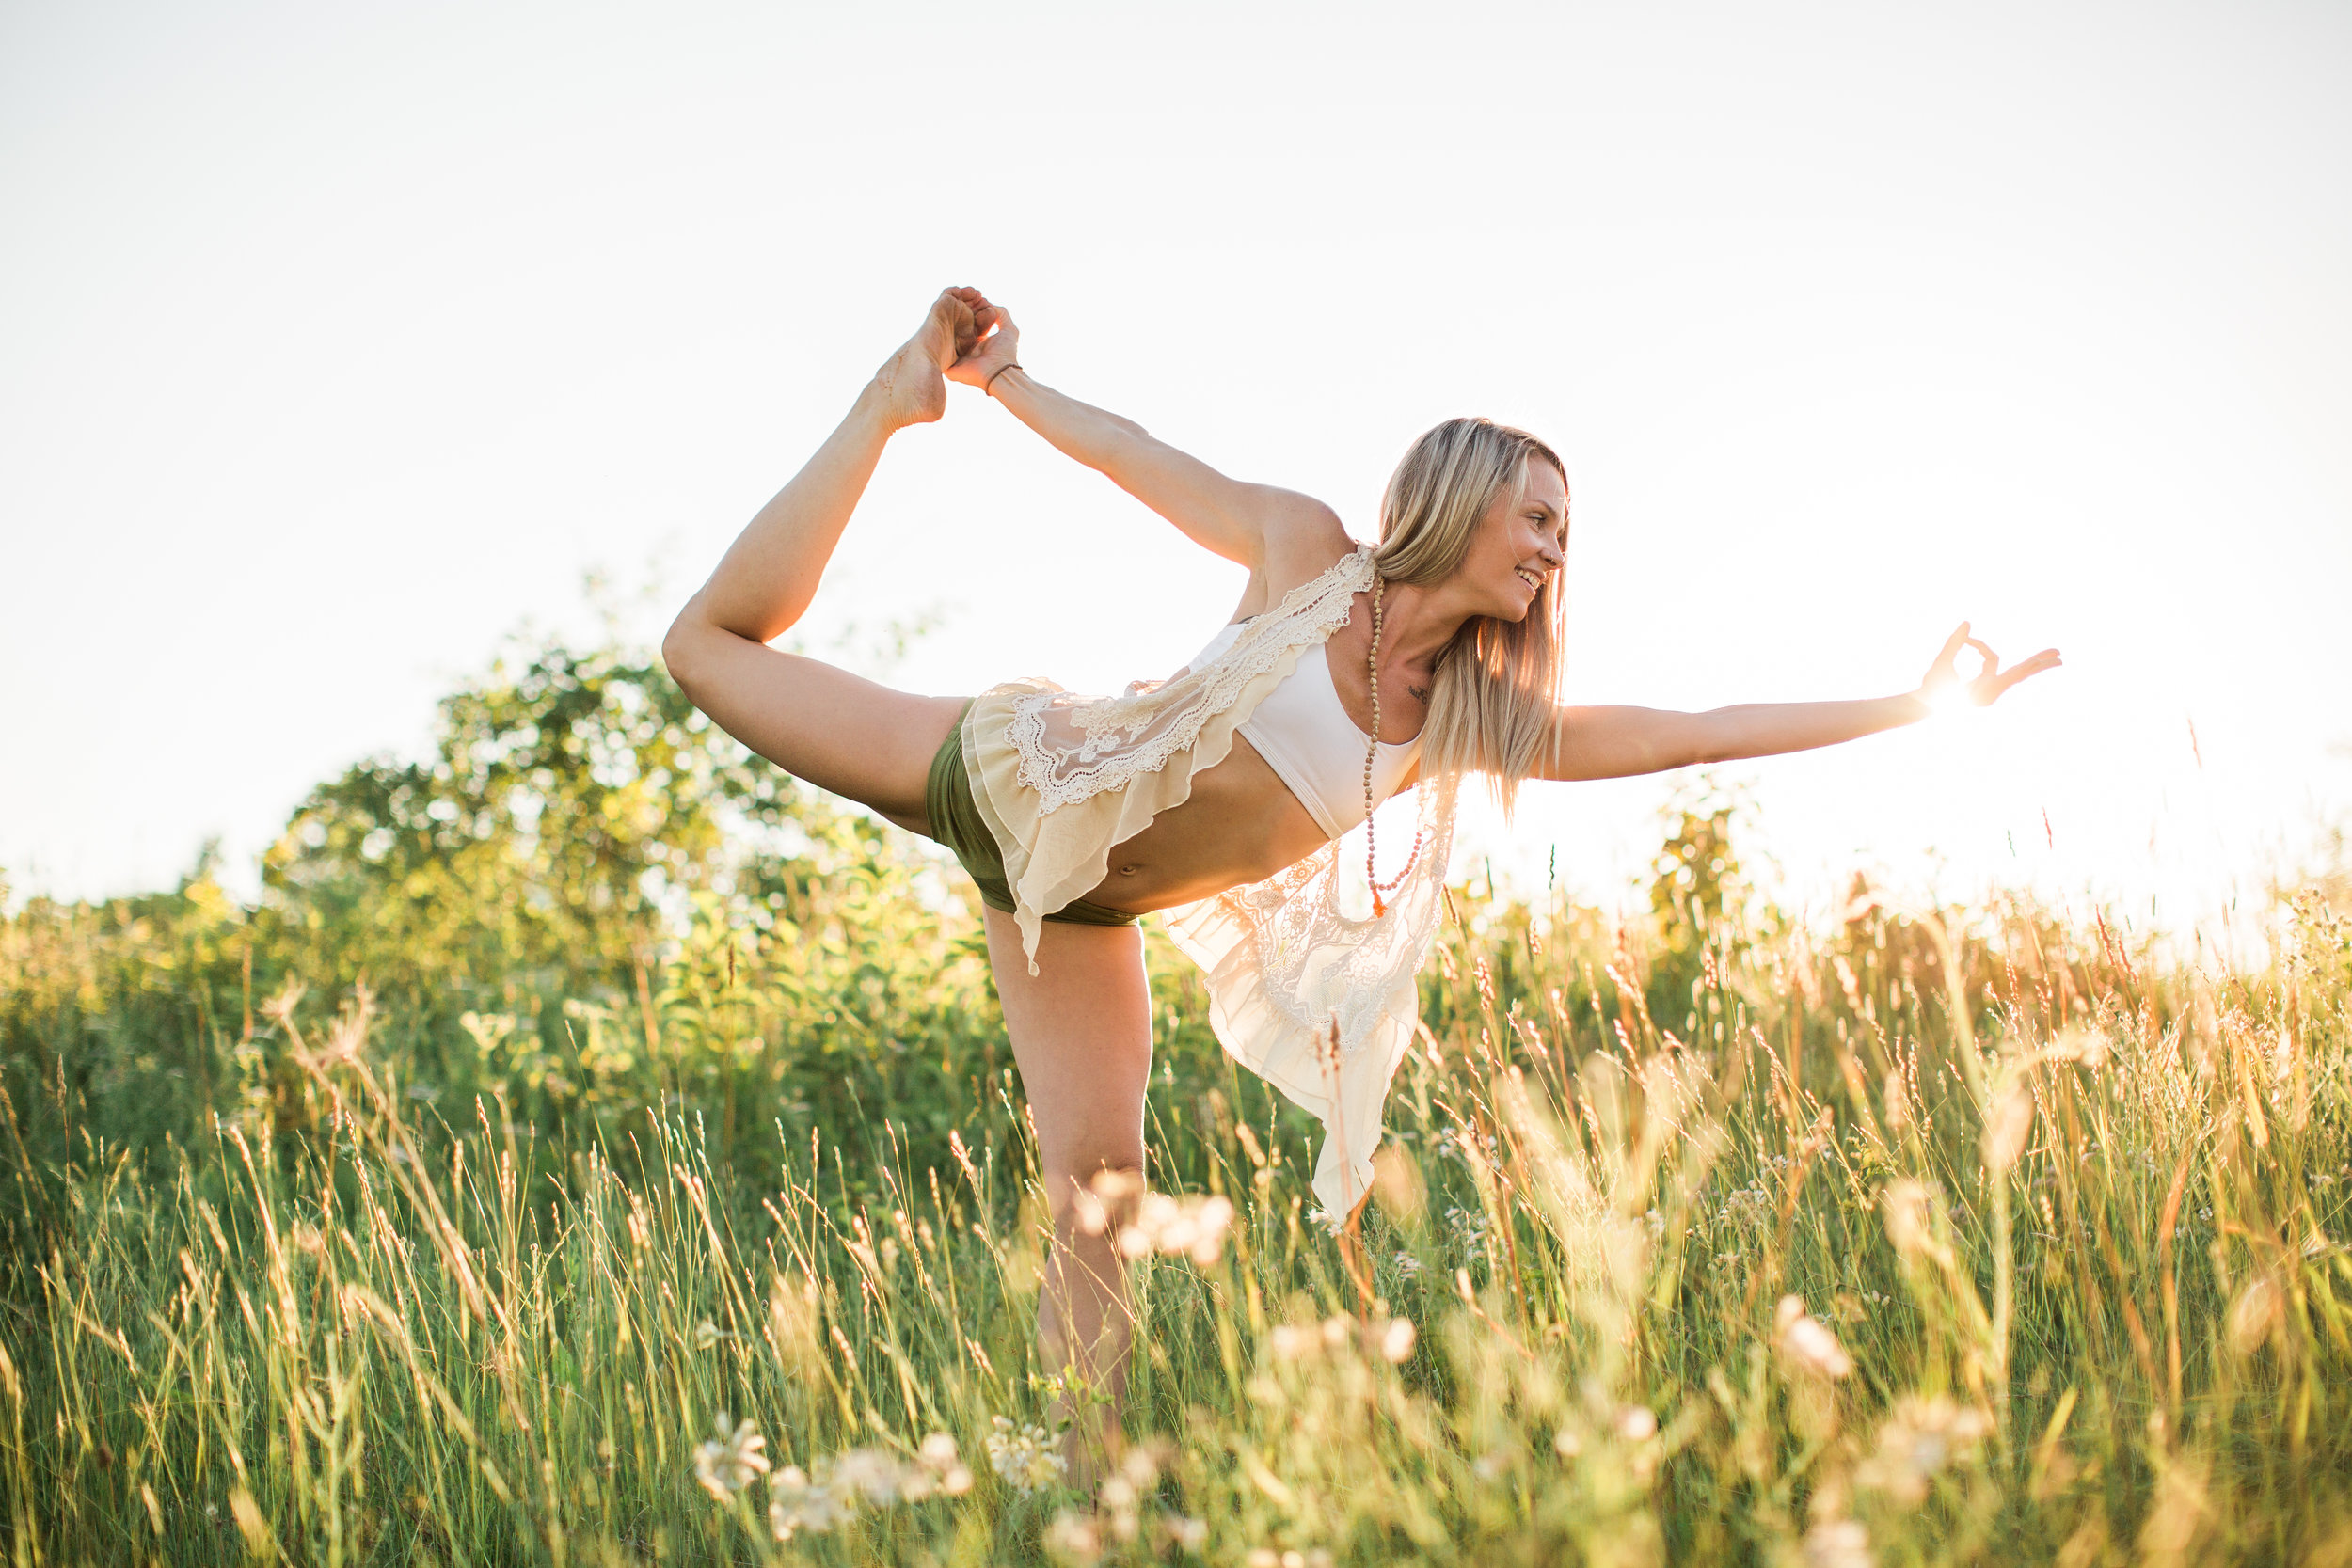 tasha-buti-yoga-janelle elaine photography-1-2.jpg